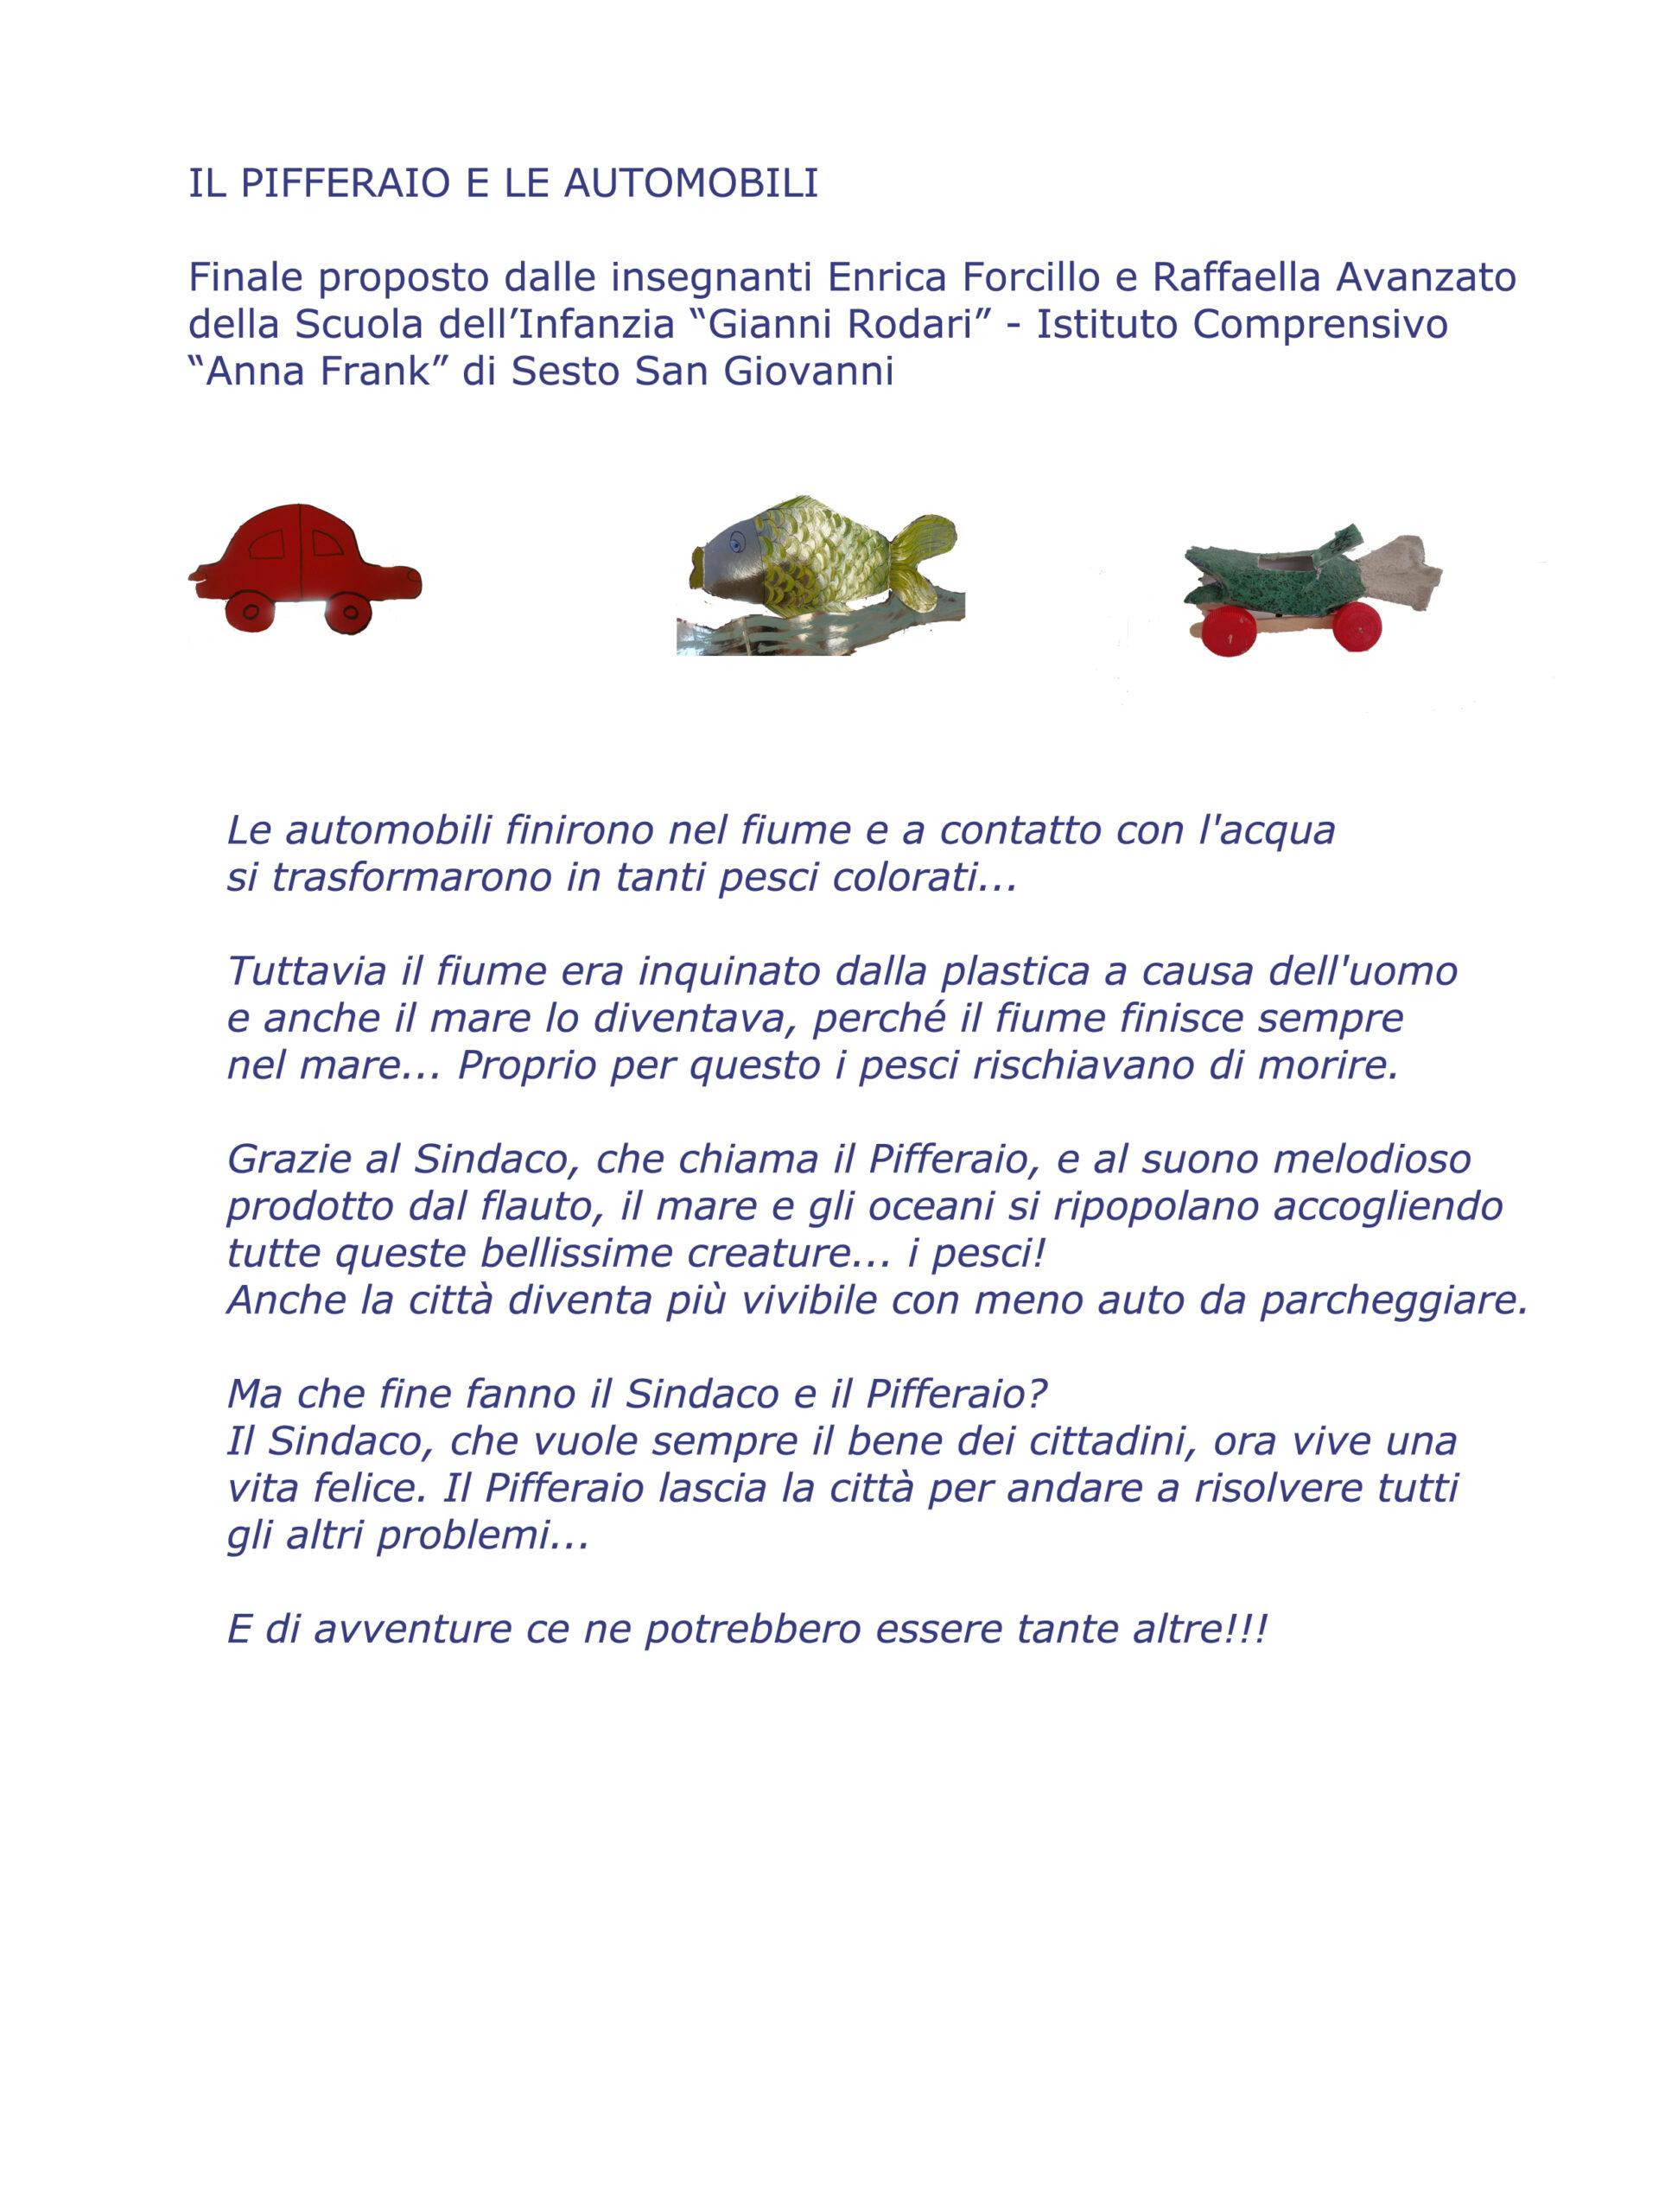 Storia Pifferaio scuola Gianni Rodari